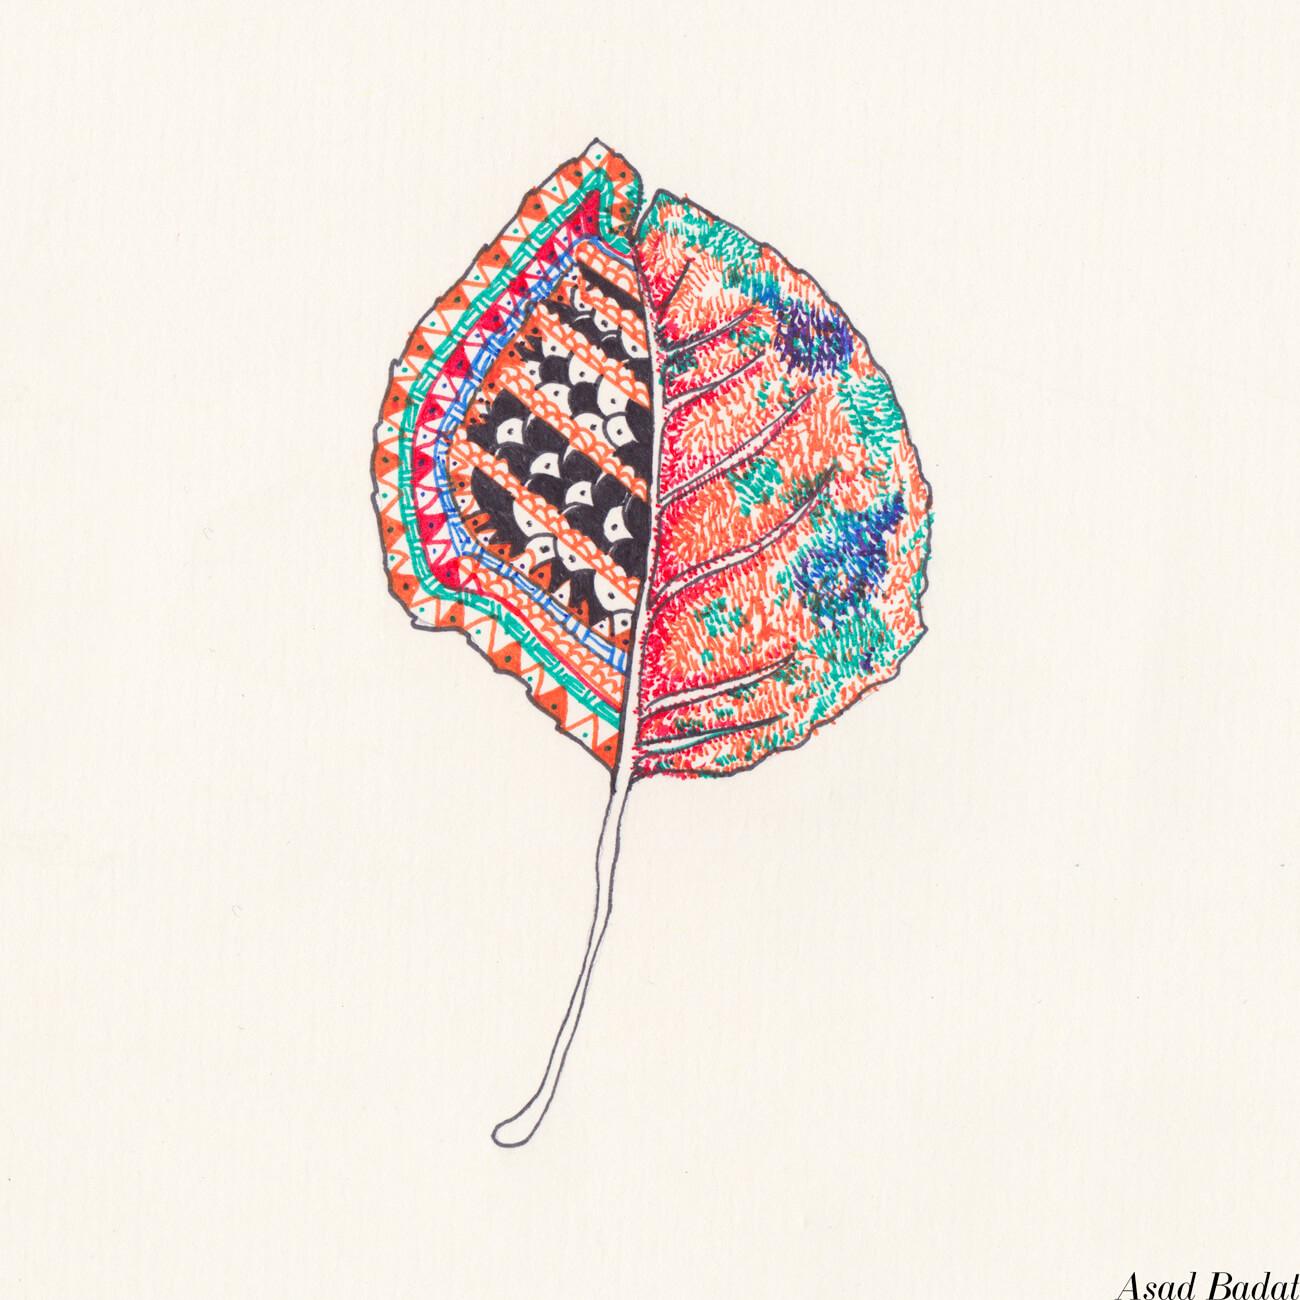 Asad-Badat-Autumn-Leaves-Drawing-2.jpg